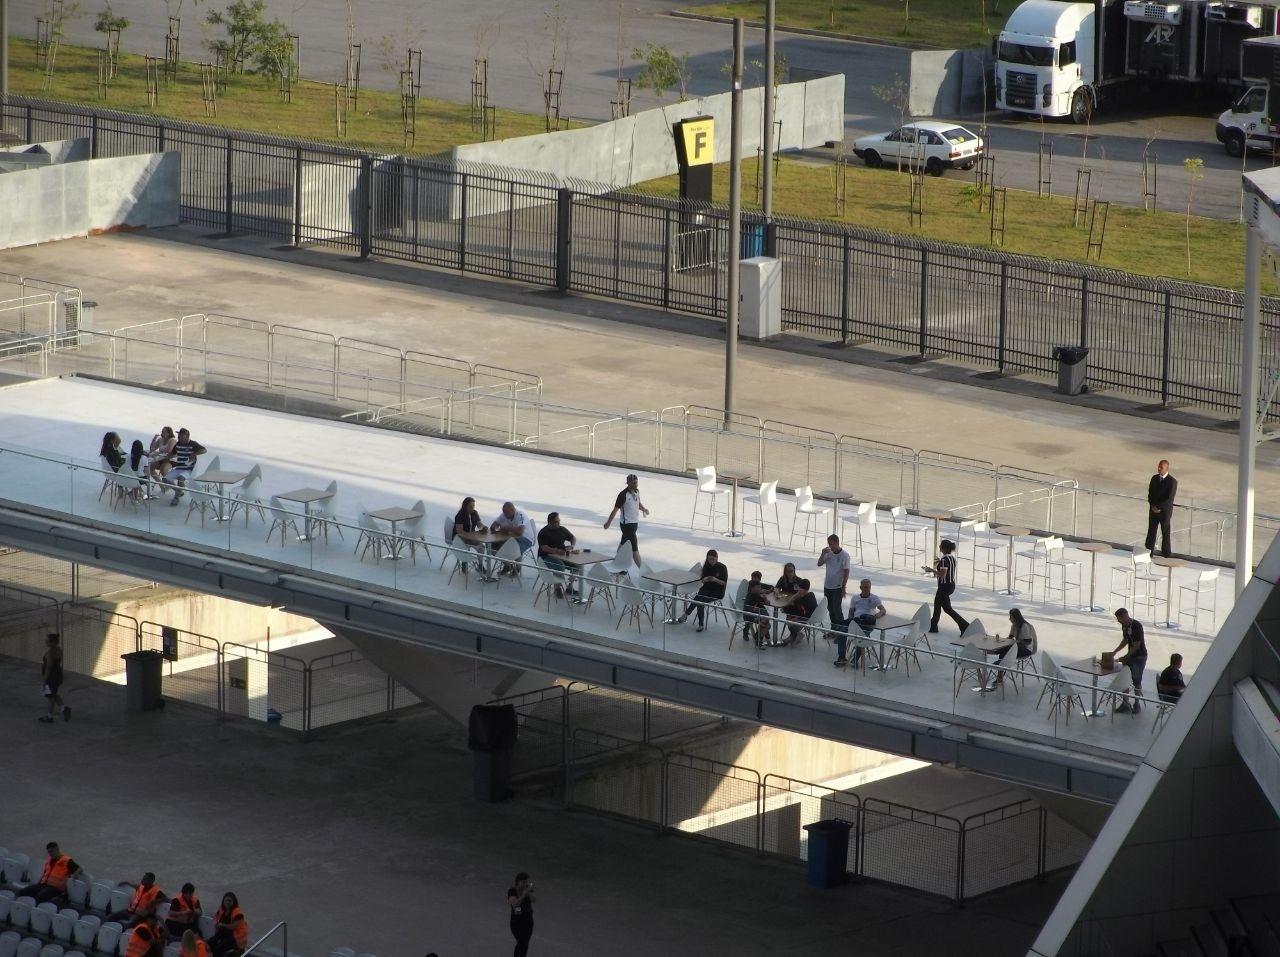 Setores vips da Arena Corinthians antes de Corinthians x Fluminense